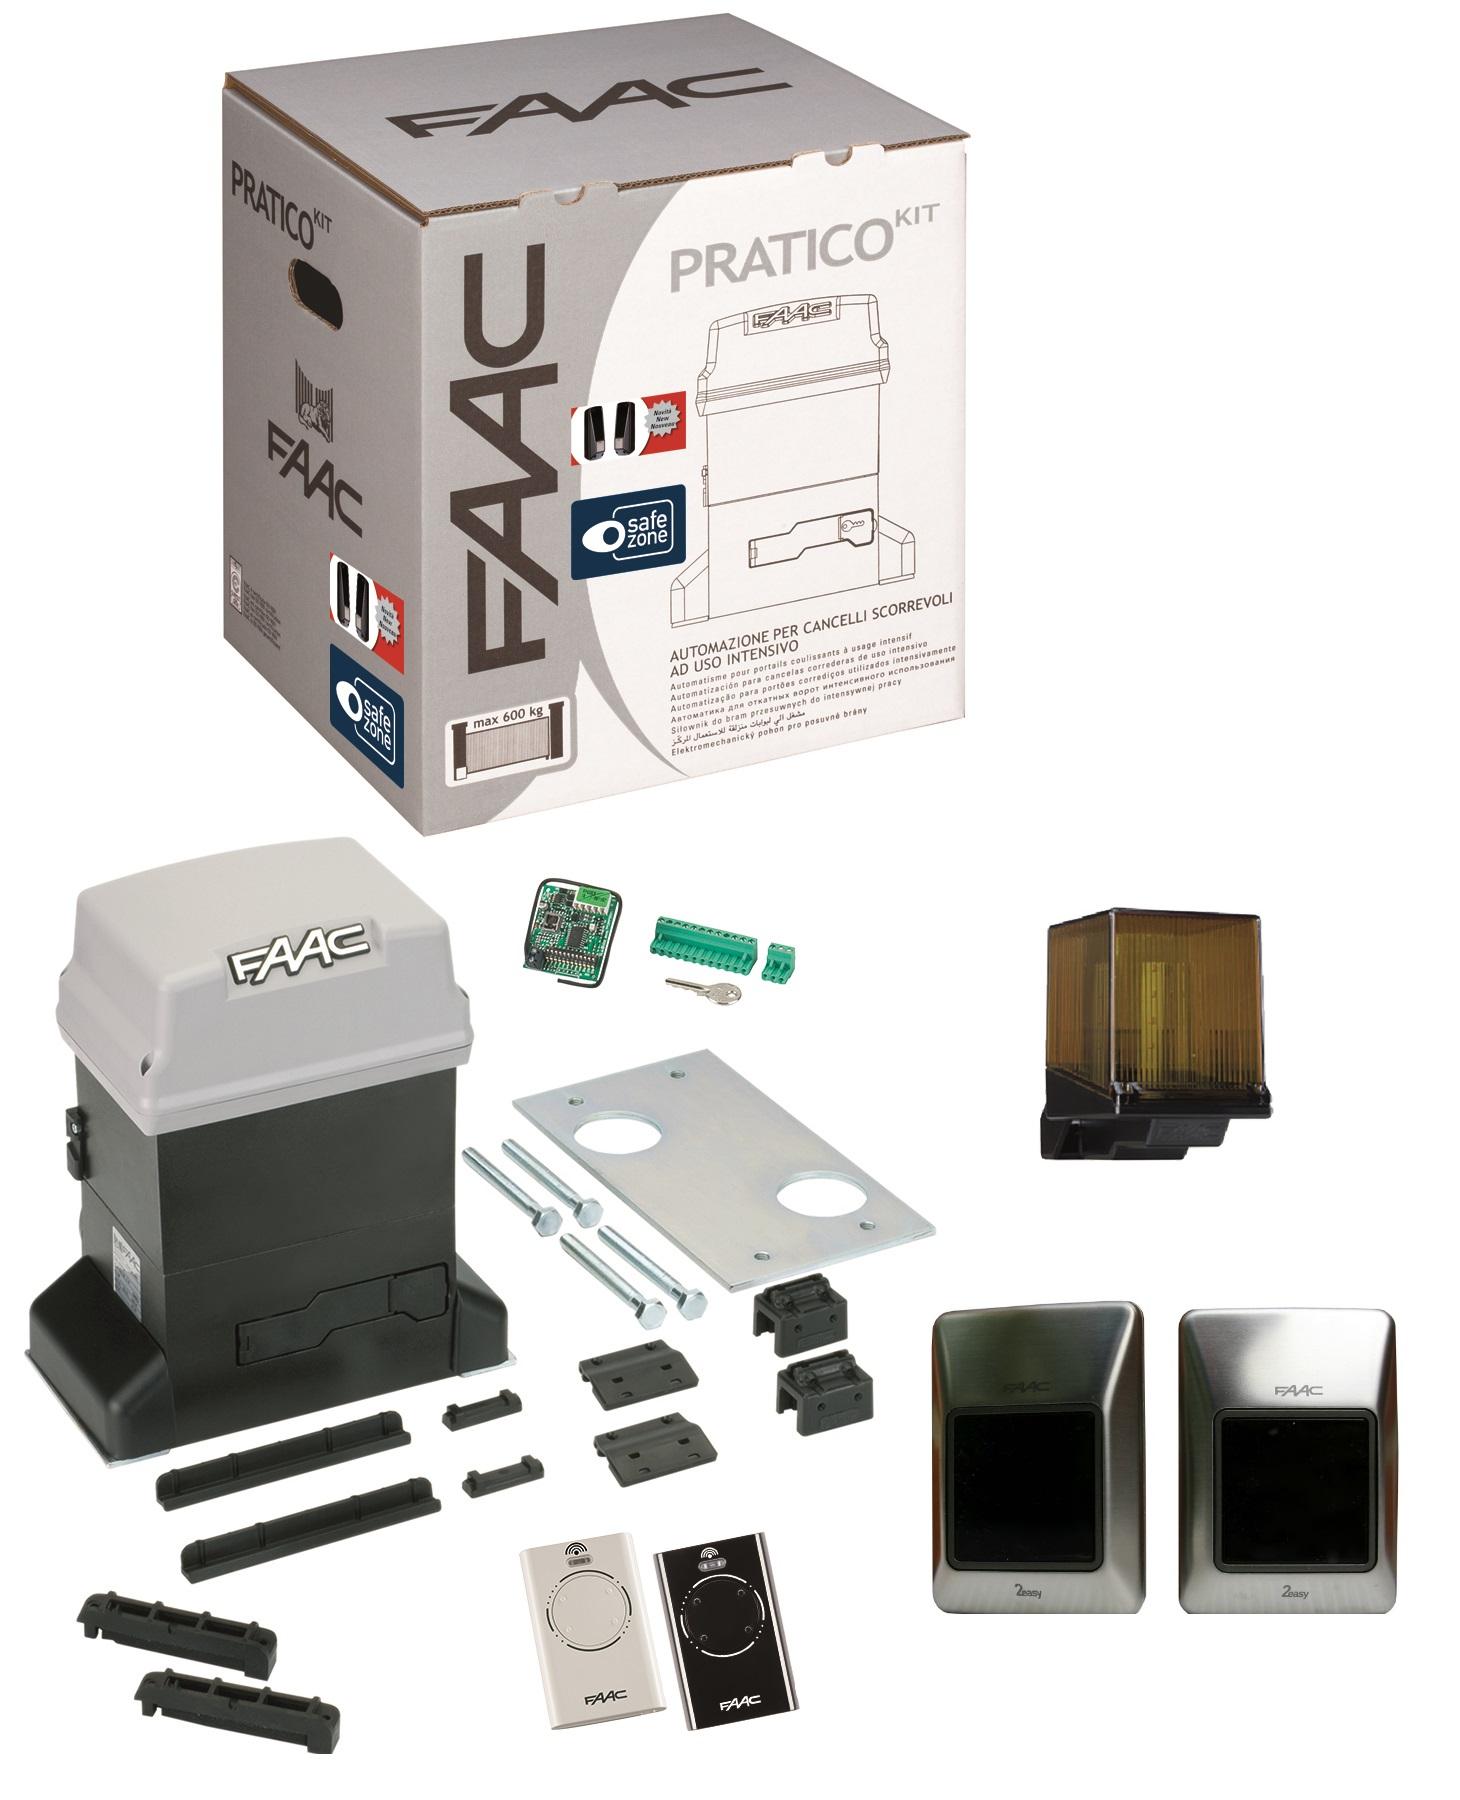 Kit Pratico Plus Integral Motorisation Portail Coulissant Faac 230v